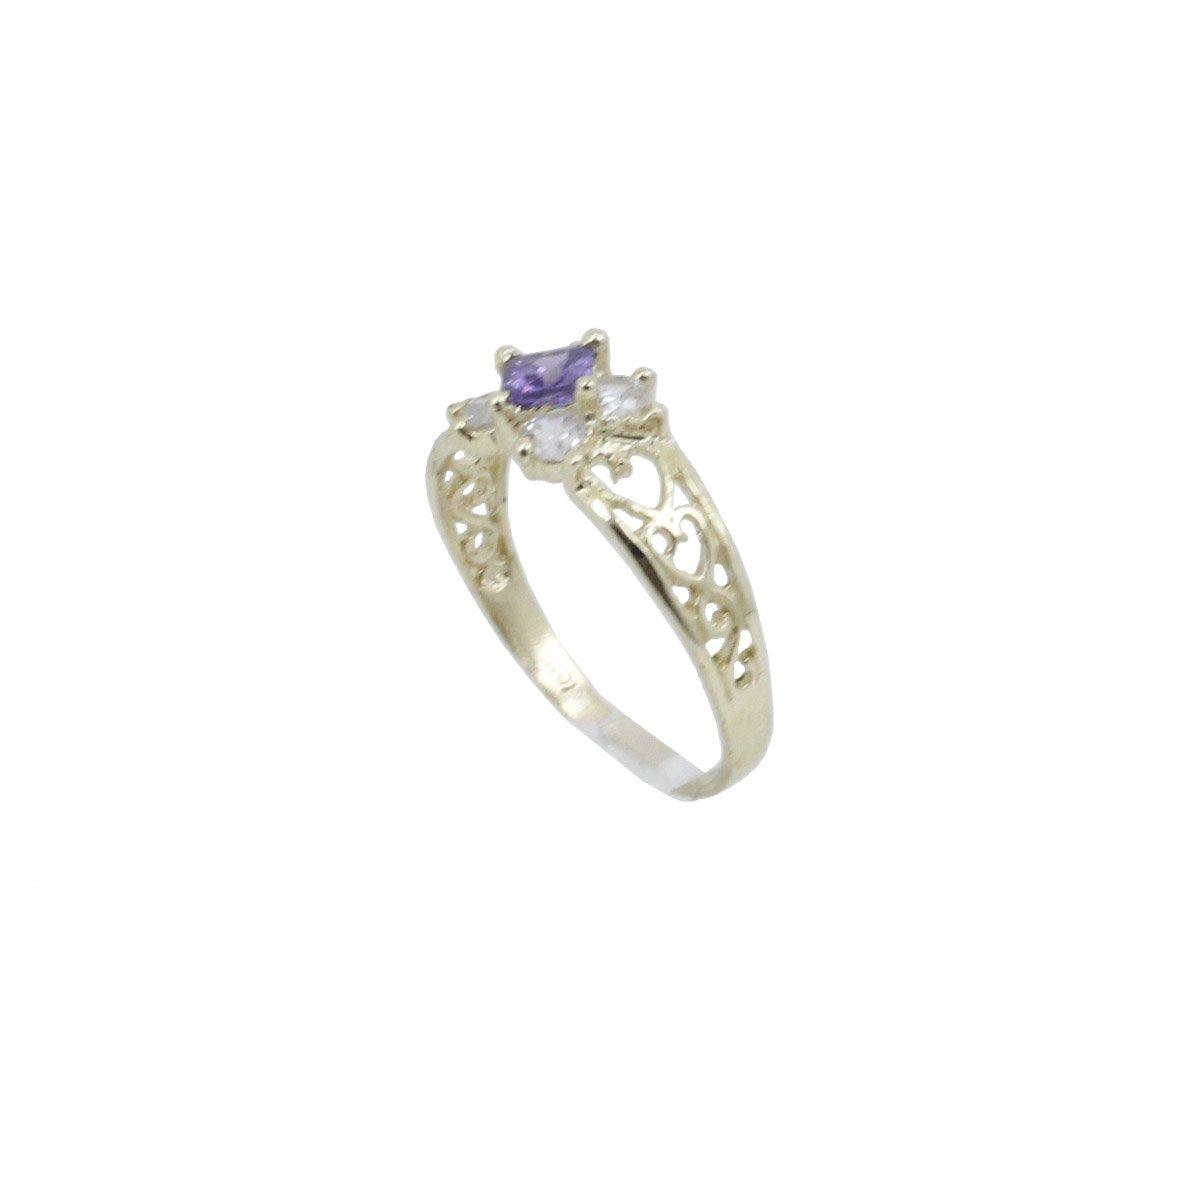 8 10k Yellow Gold Syntetic blue gemstone ring ajr65 Size